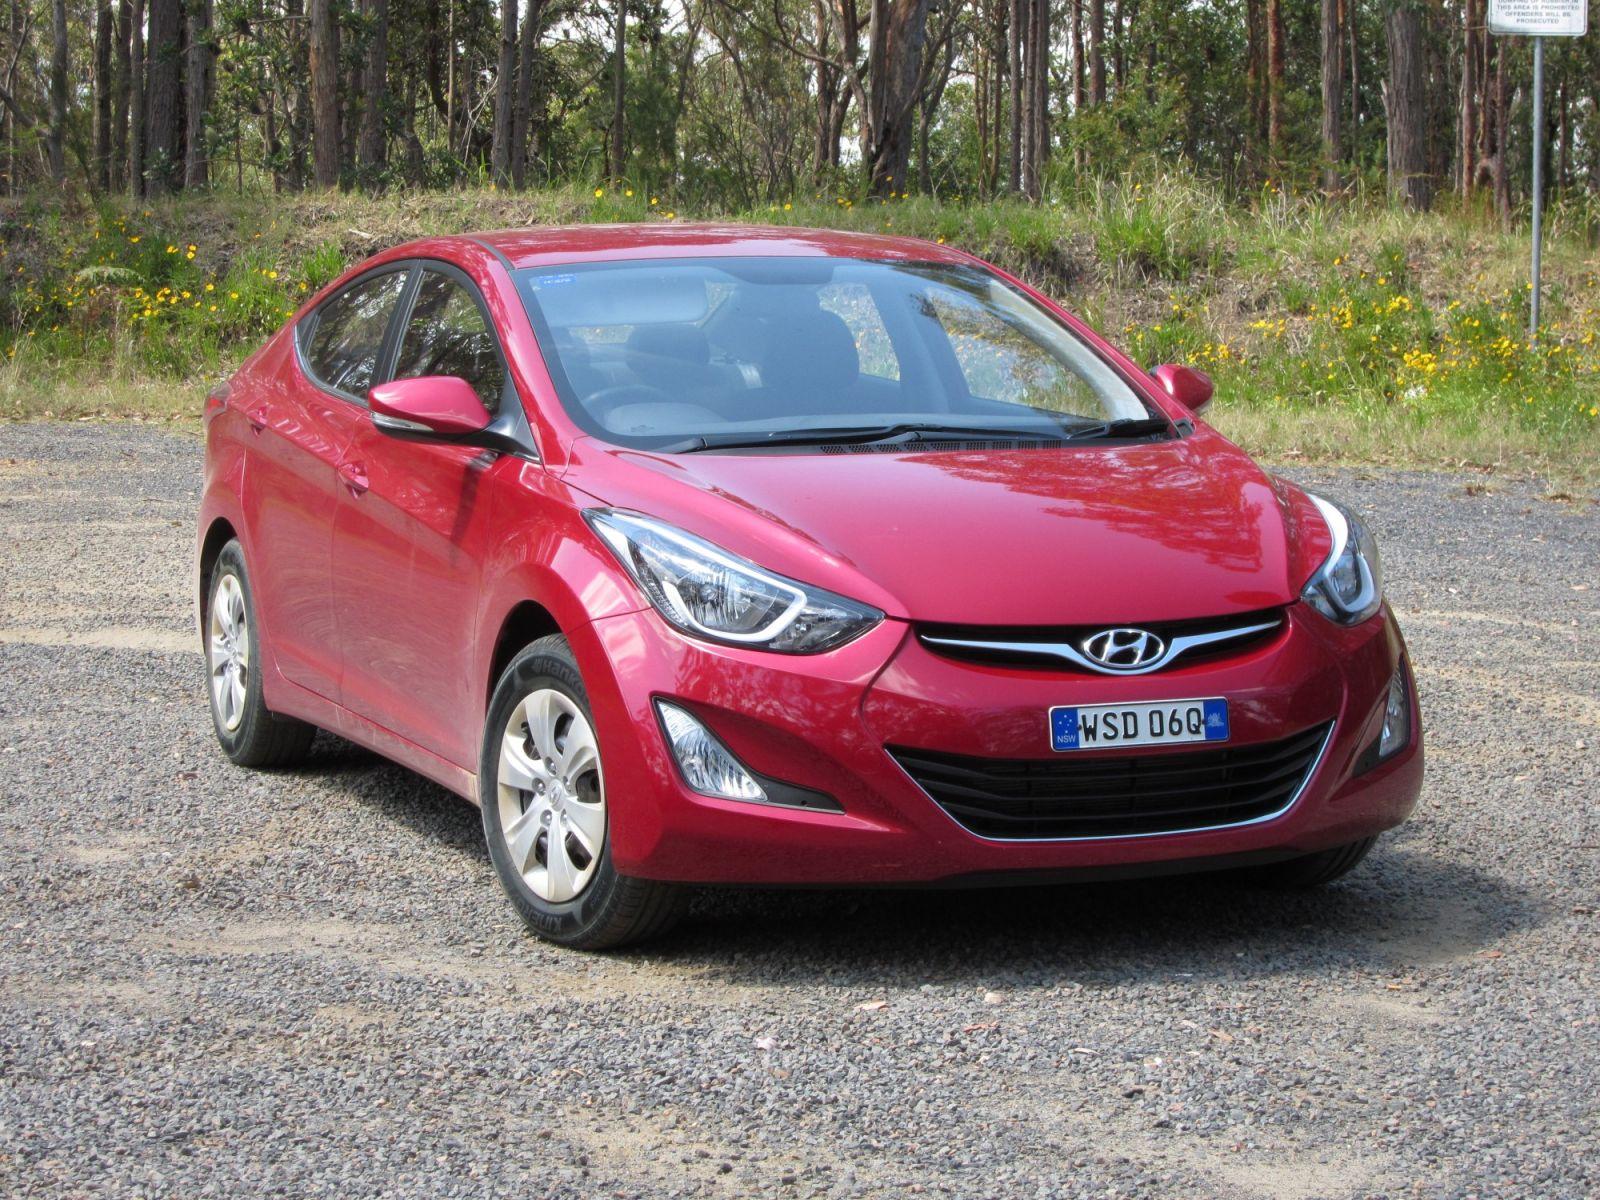 2014 Hyundai Elantra Series 2 Review